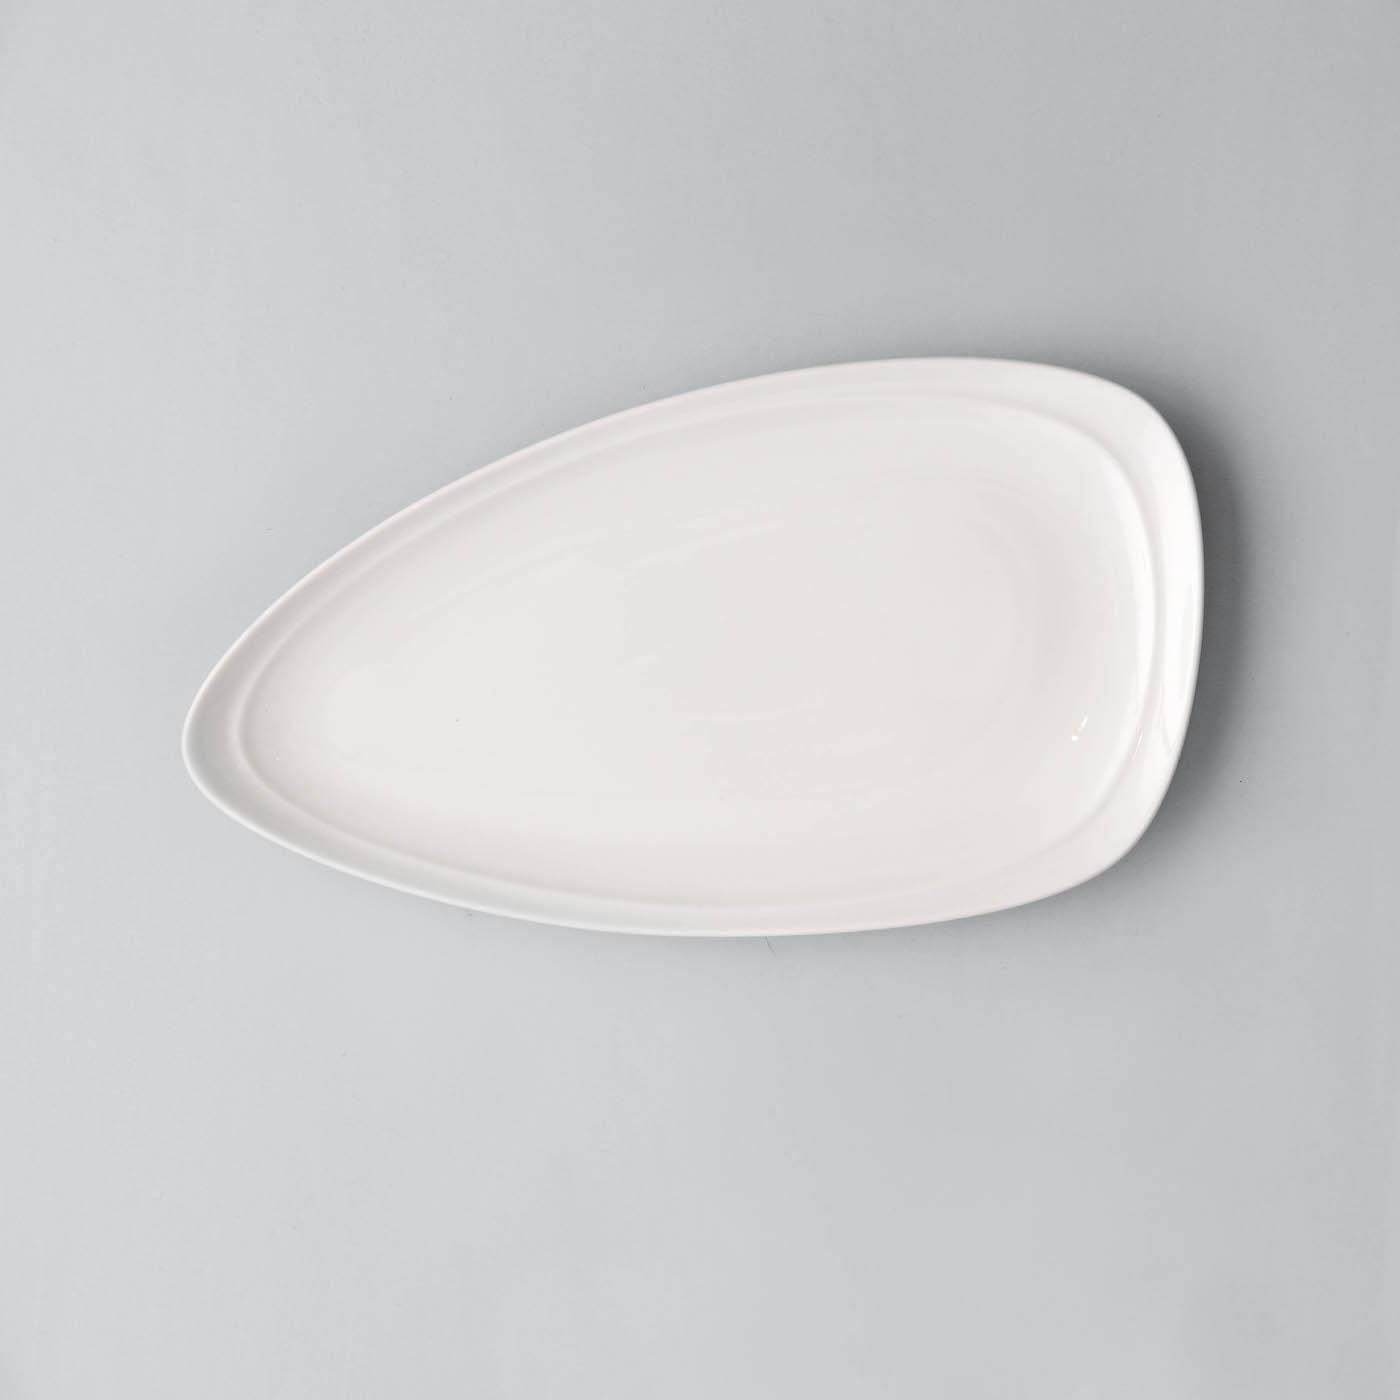 Fuente Oval Mood 24x41 cm